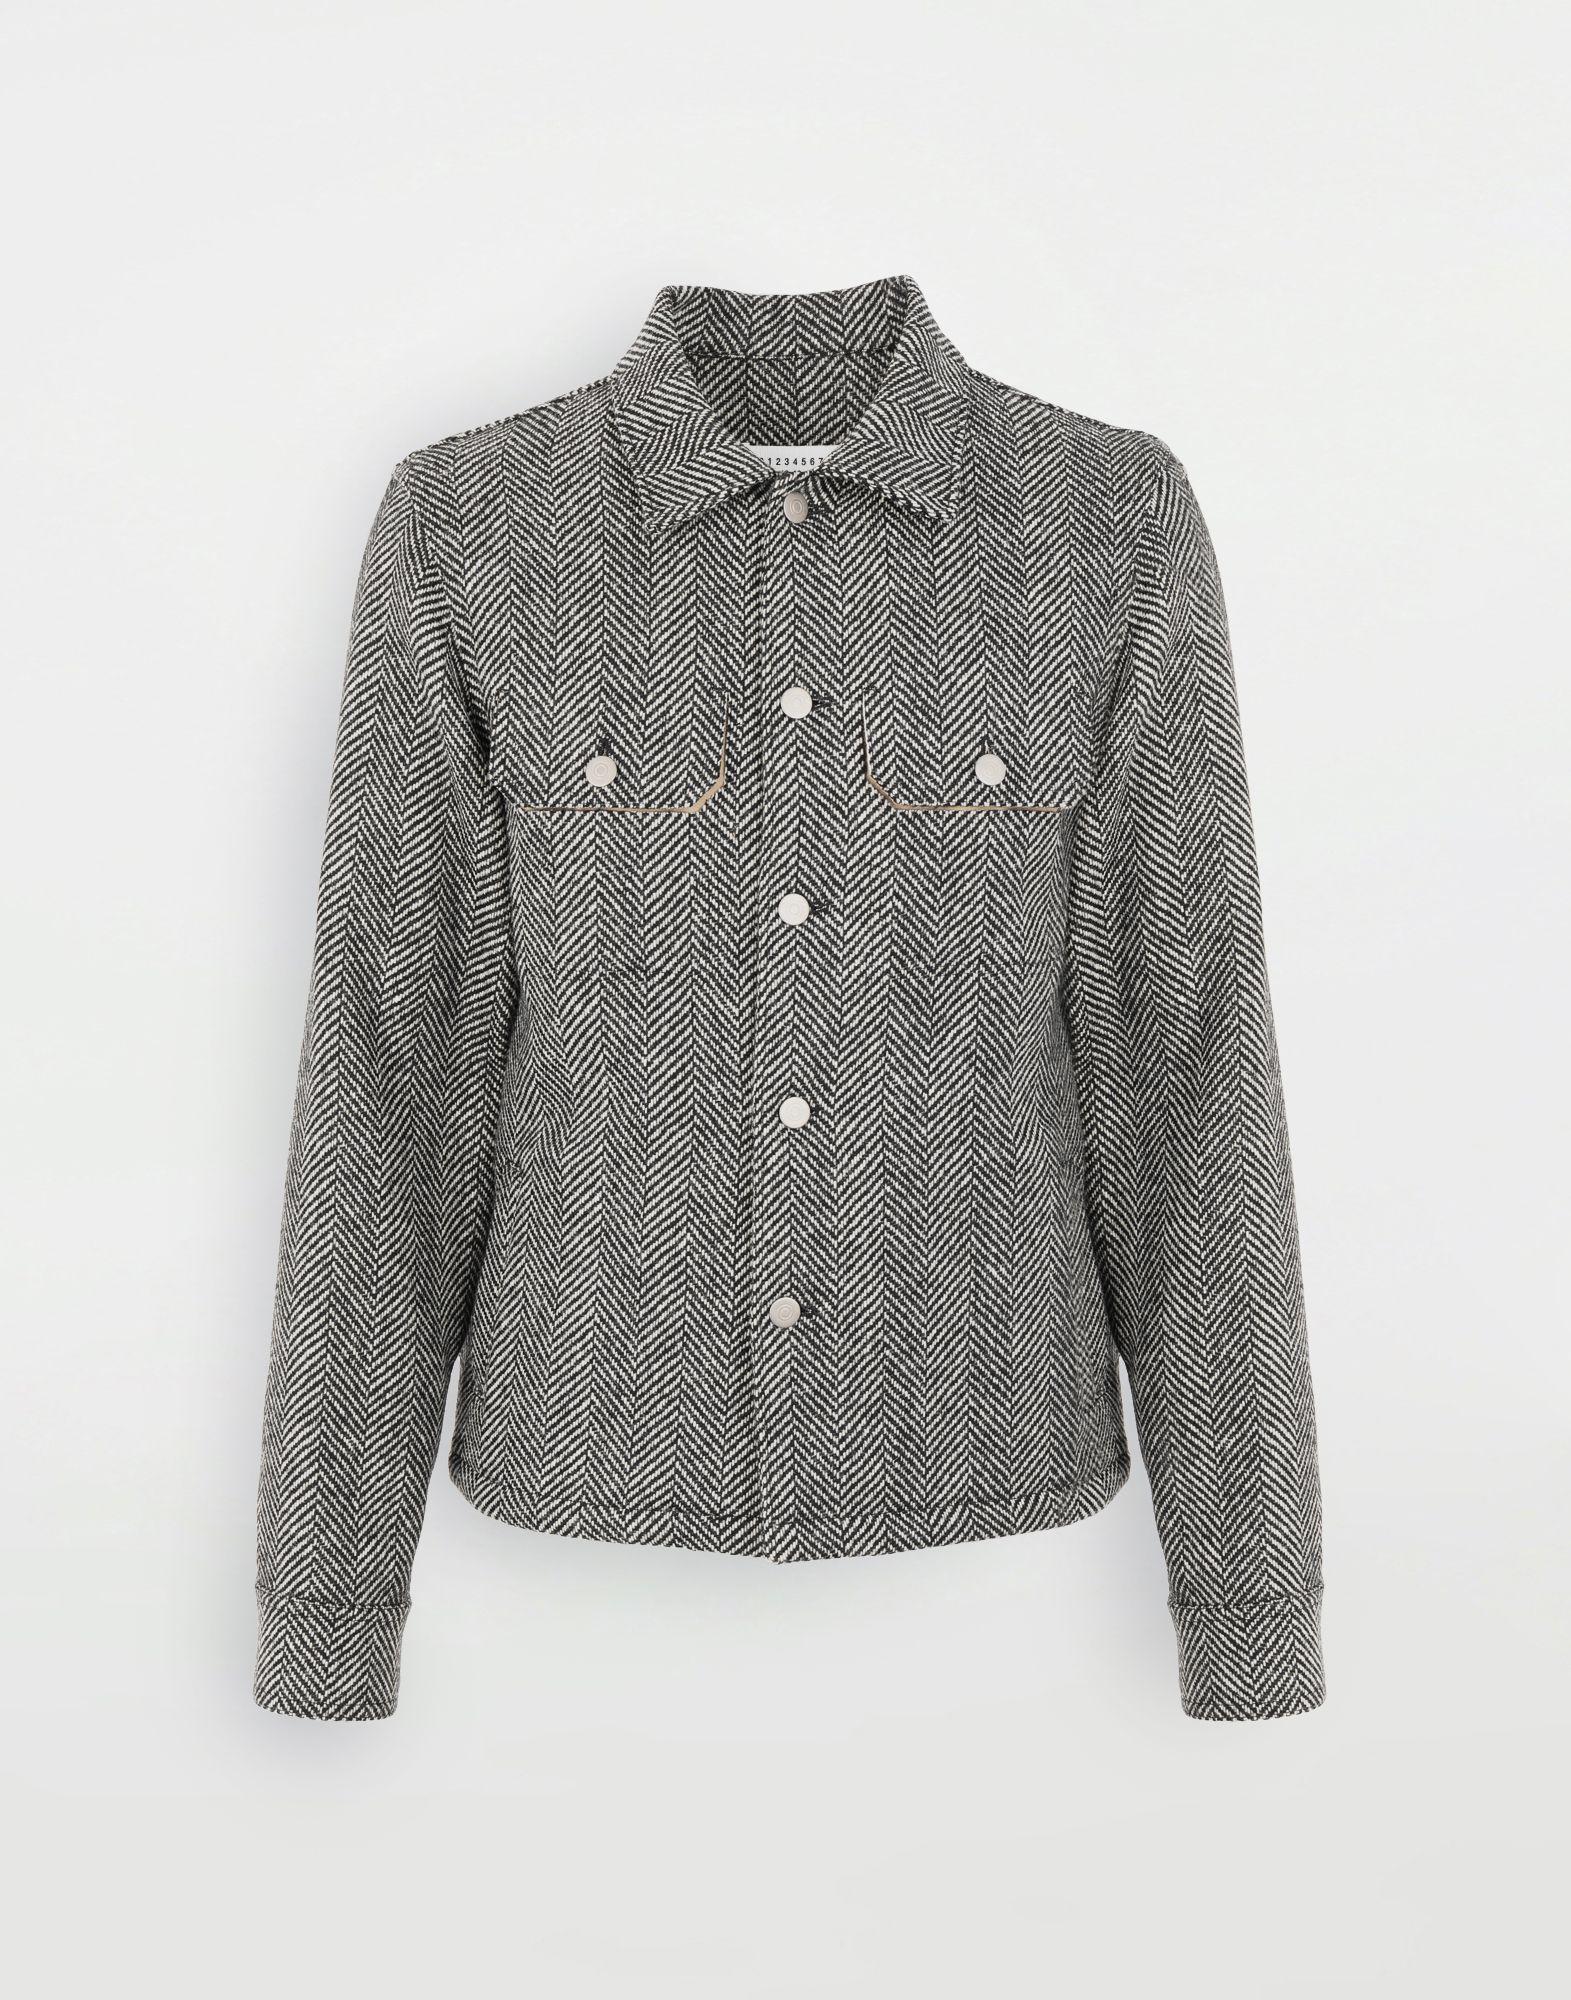 MAISON MARGIELA Décortiqué herringbone jacket Jacket Man f